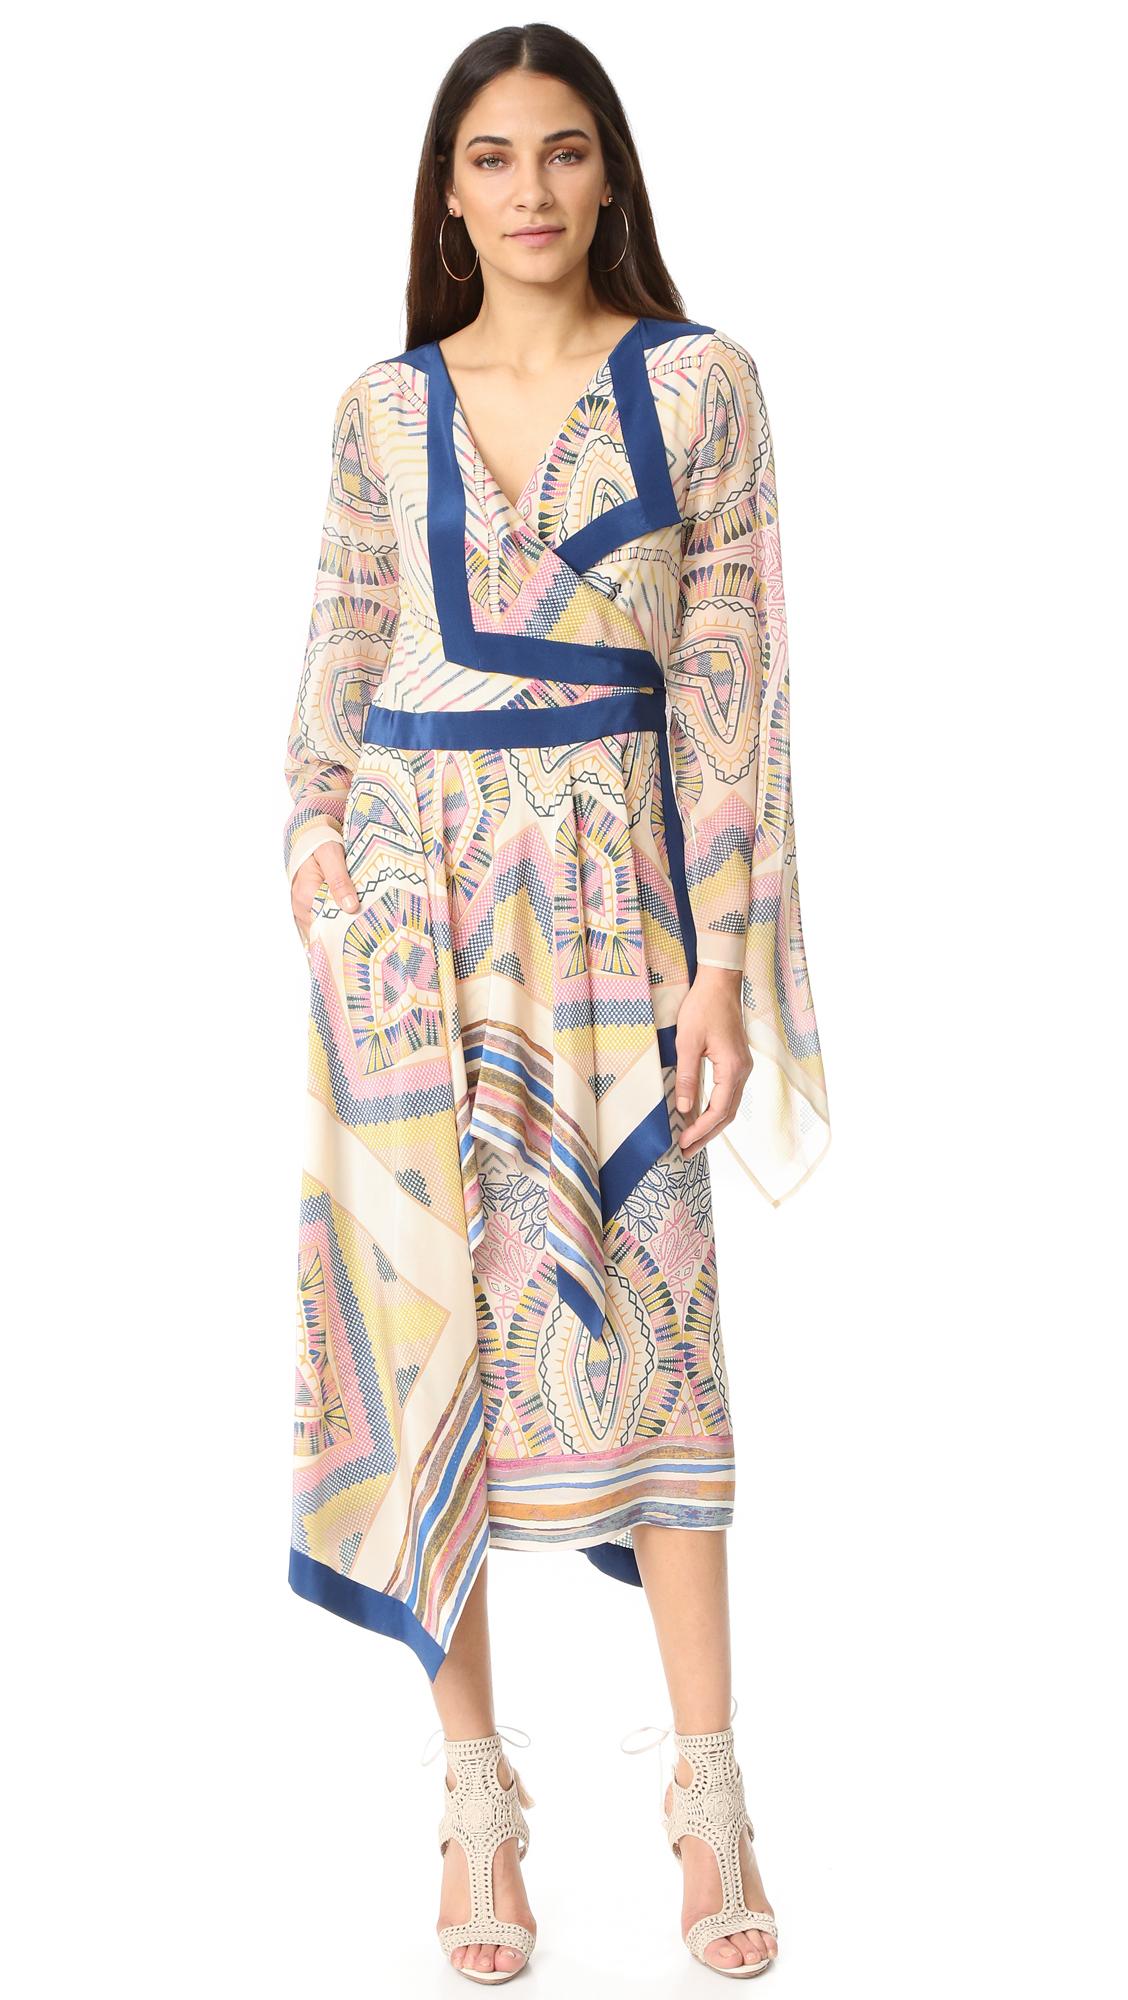 Bcbgmaxazria Leda Dress - Cream Combo at Shopbop